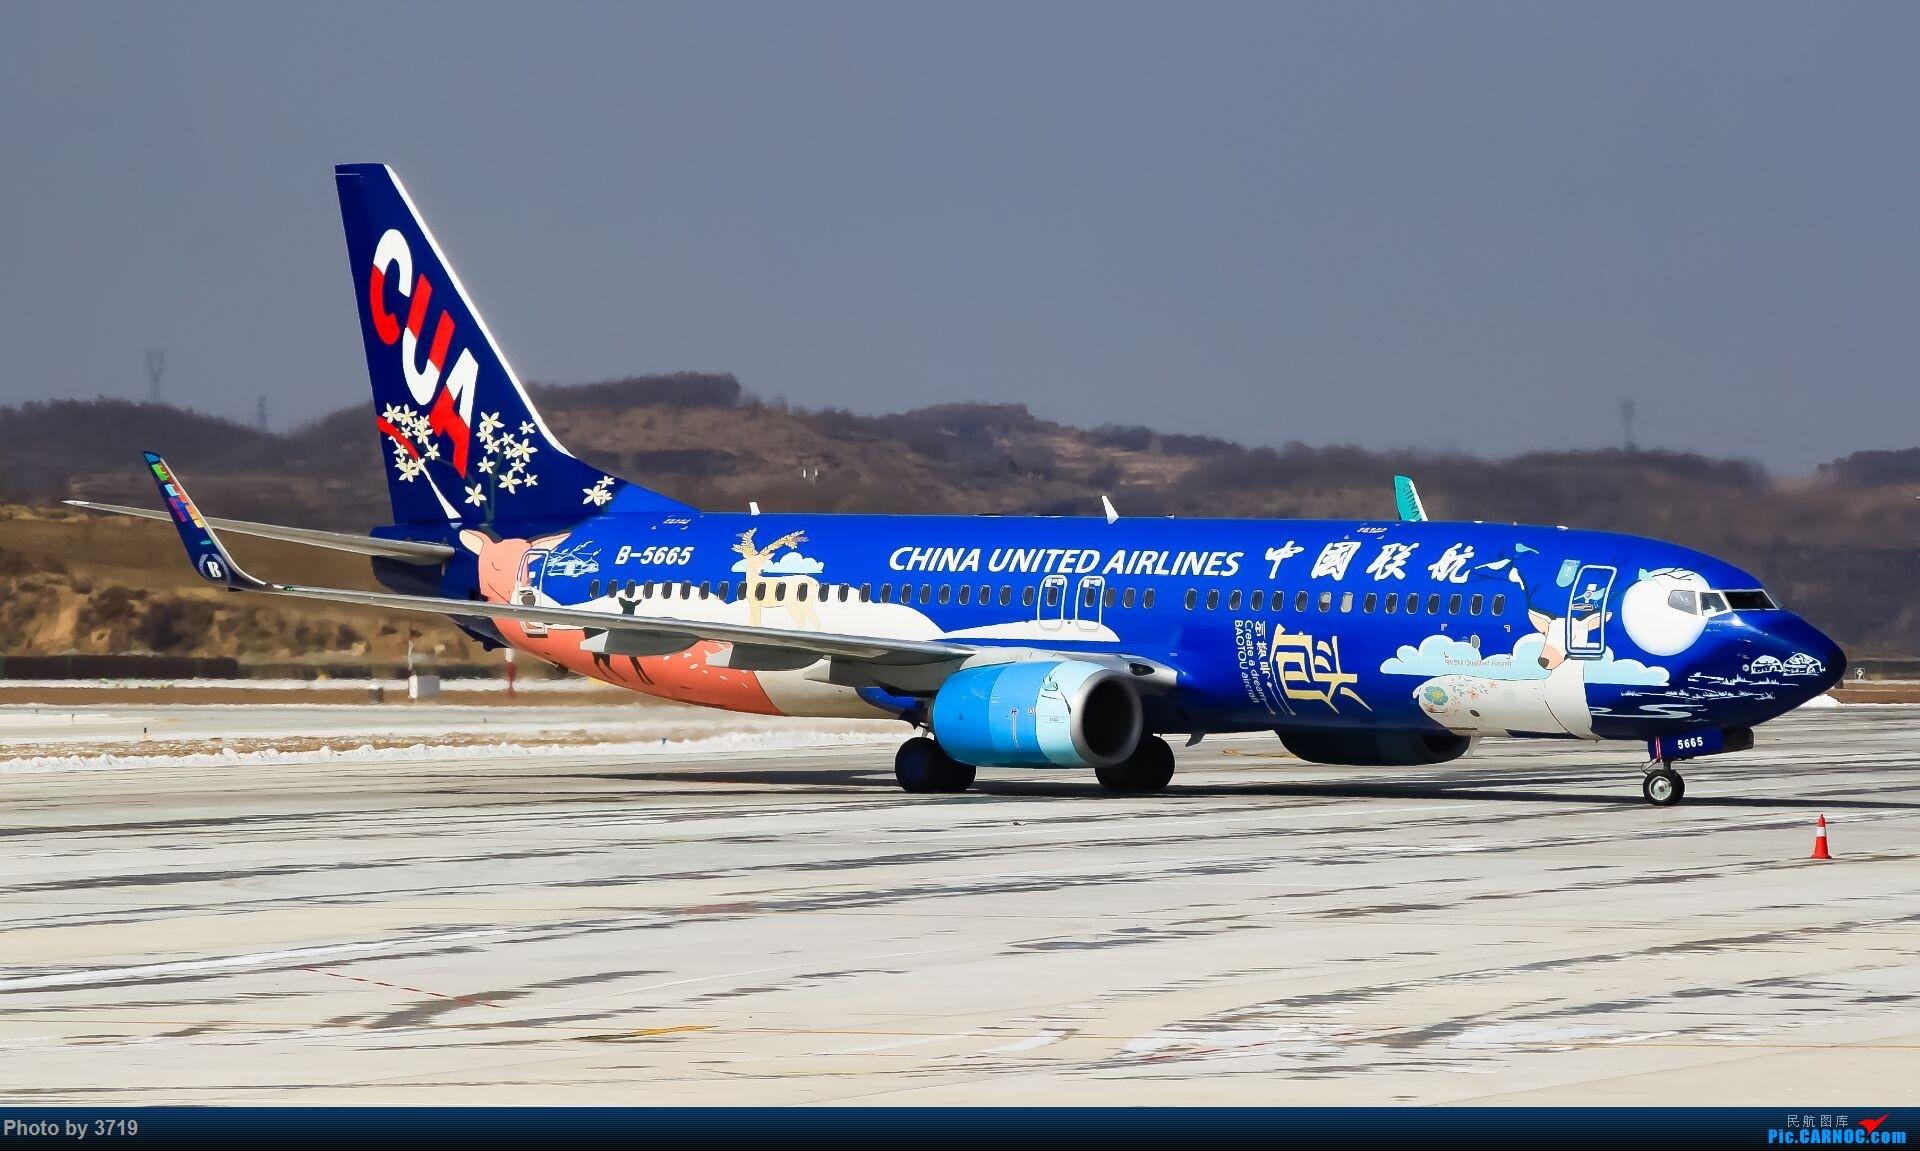 Re:[原创]延安南泥湾之黄金光 BOEING 737-800 B-5665 中国延安南泥湾机场